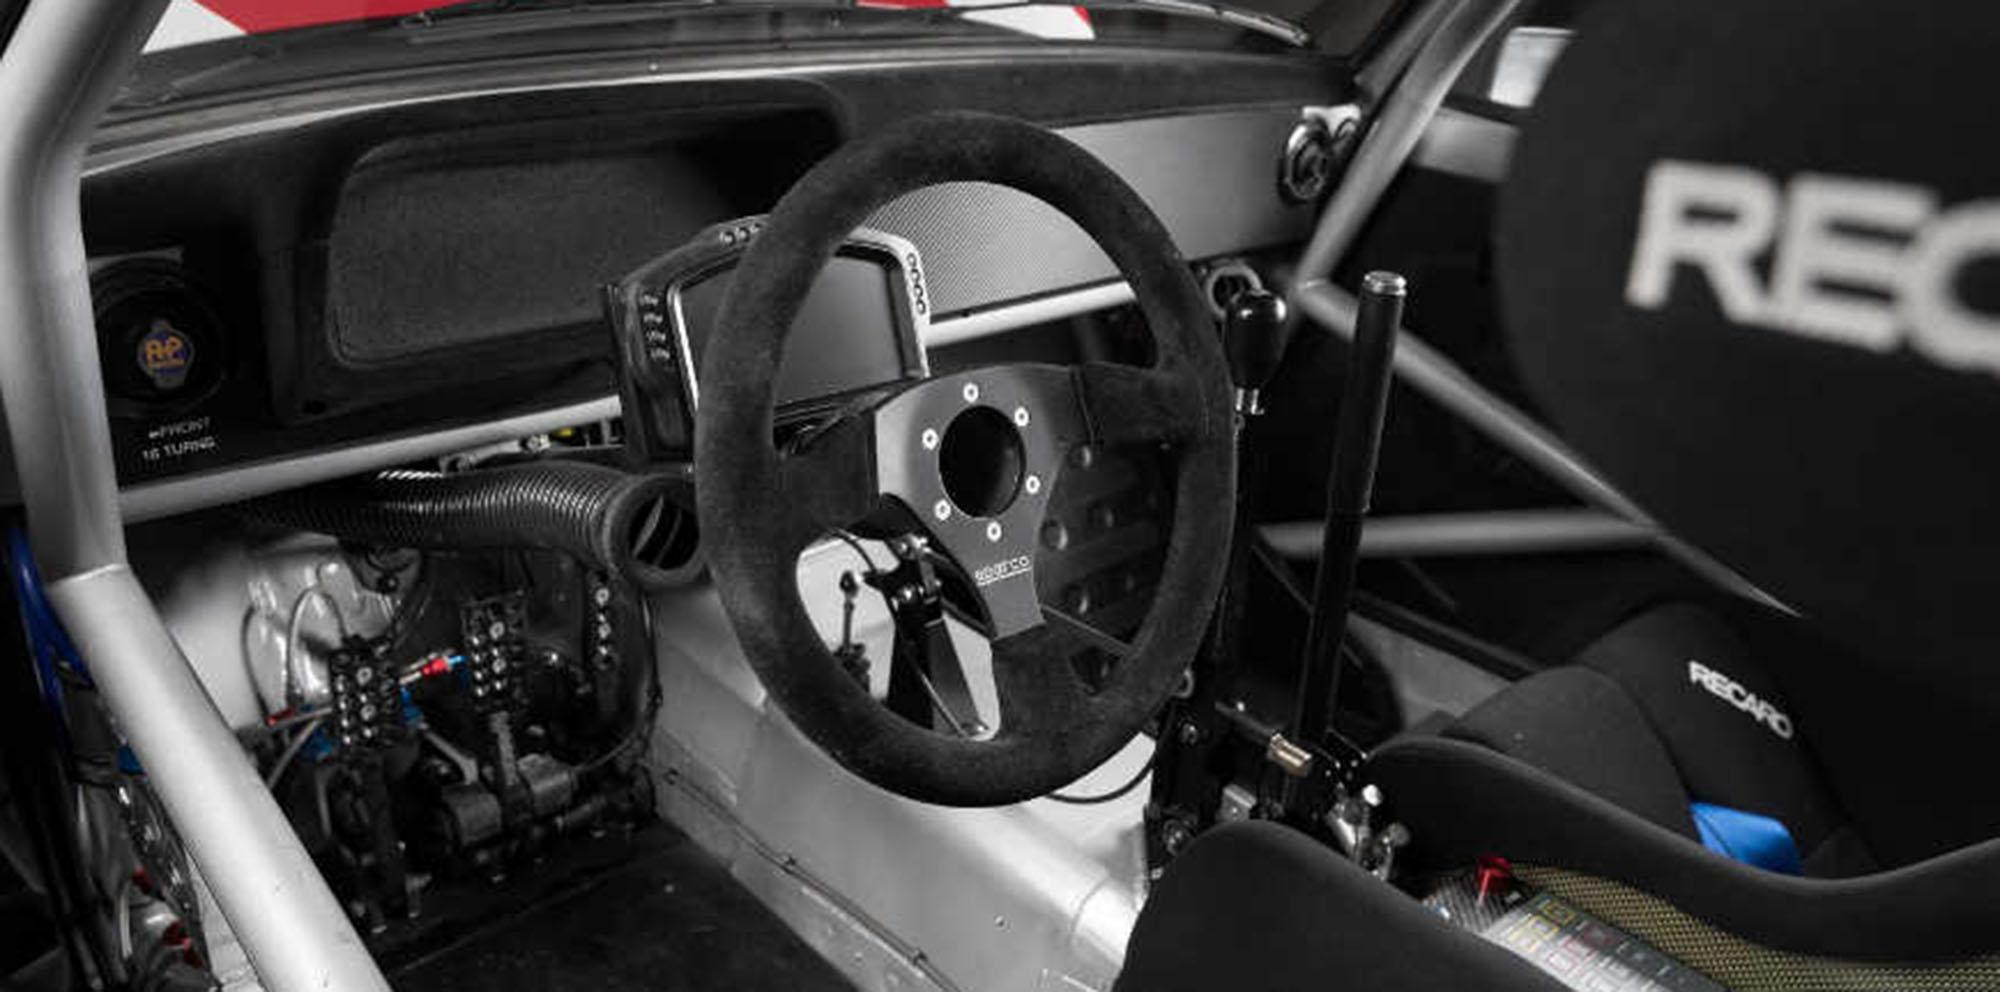 Mazda Cx 5 2015 Interior >> Ken Block reveals new RWD Ford Escort Gymkhana vehicle - photos | CarAdvice